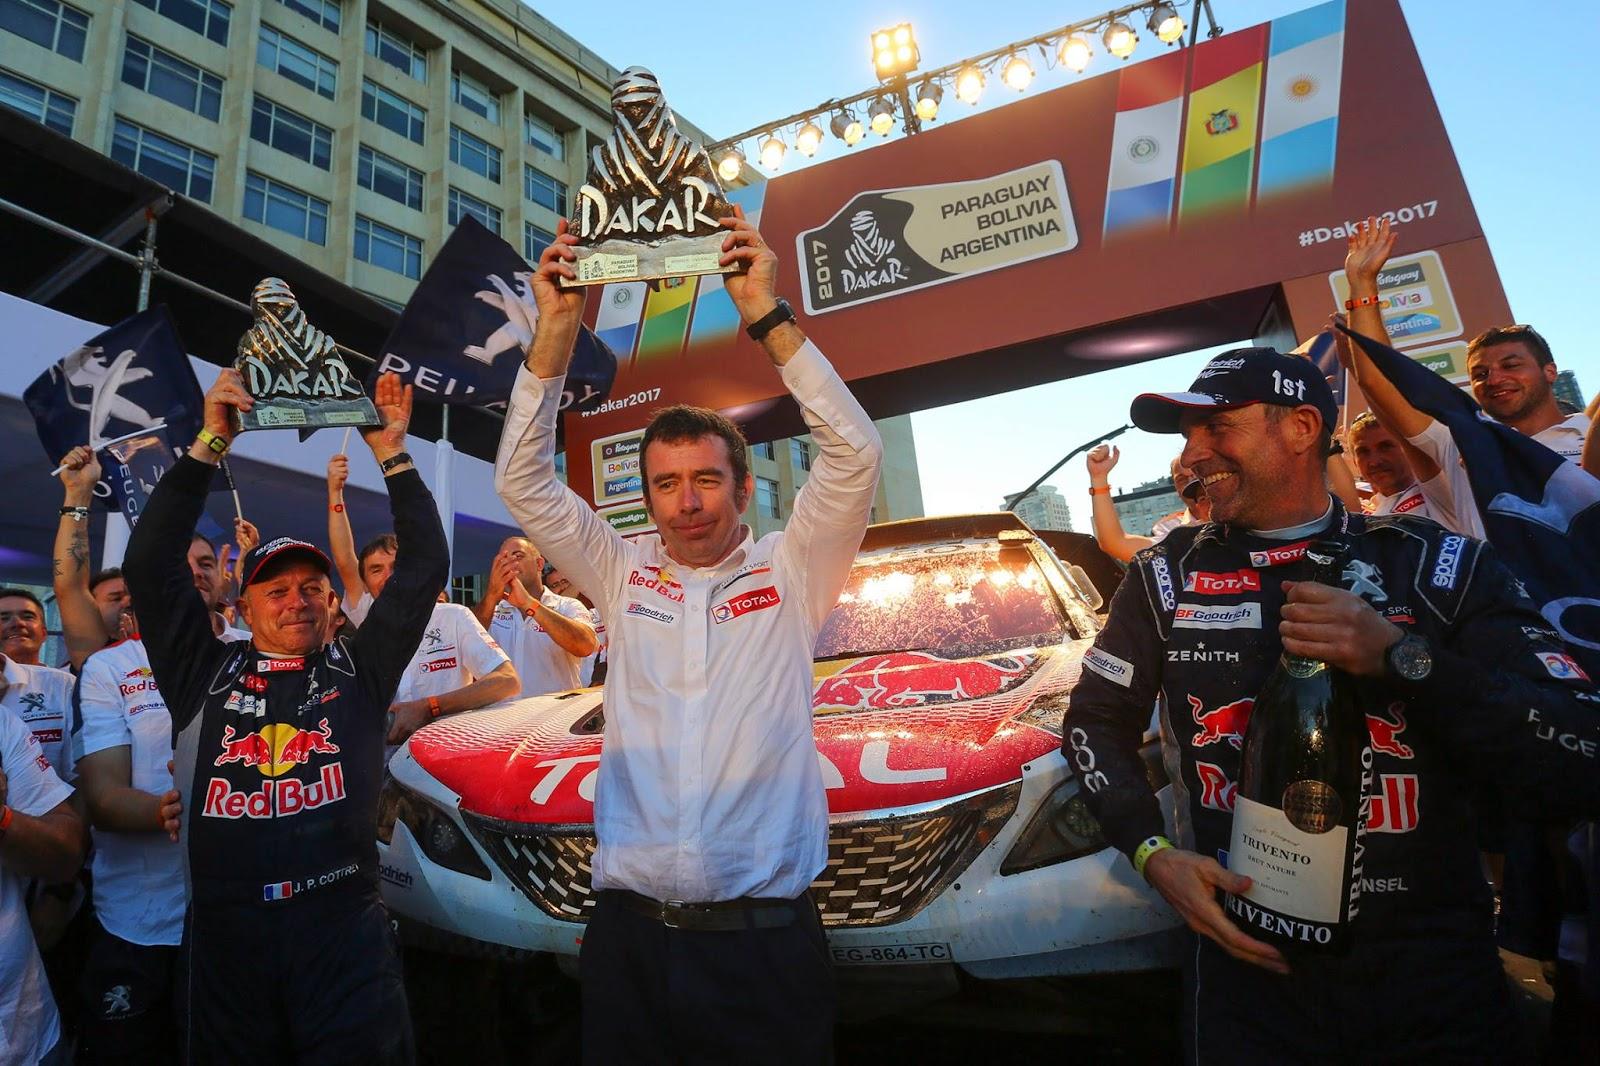 16112695 1342932679099369 7426555654807030203 o Τα πιο εντυπωσιακά πλάνα από το φετινό αγώνα Dakar και ο θρίαμβος της Peugeot Peugeot, PEUGEOT 3008, PEUGEOT 3008 DKR, Rally, Rally Dakar, videos